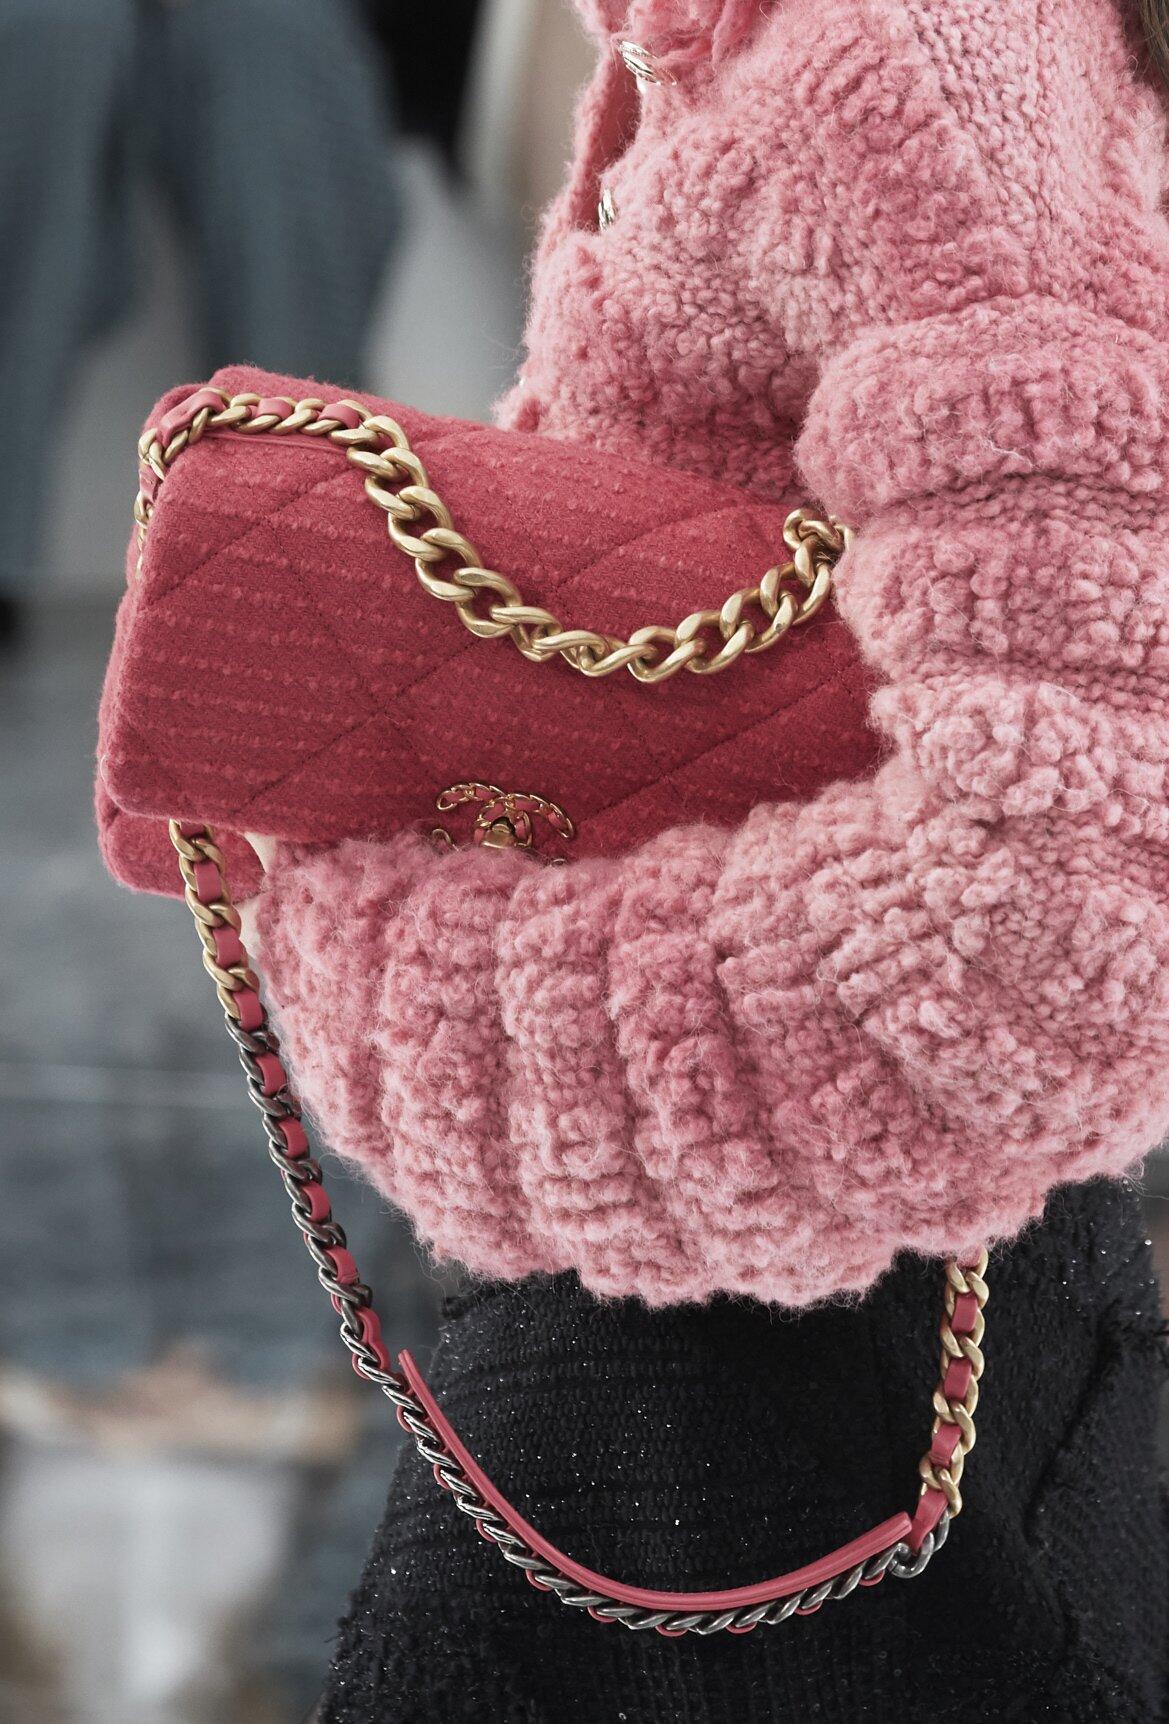 Chanel Bag 2020 Collection